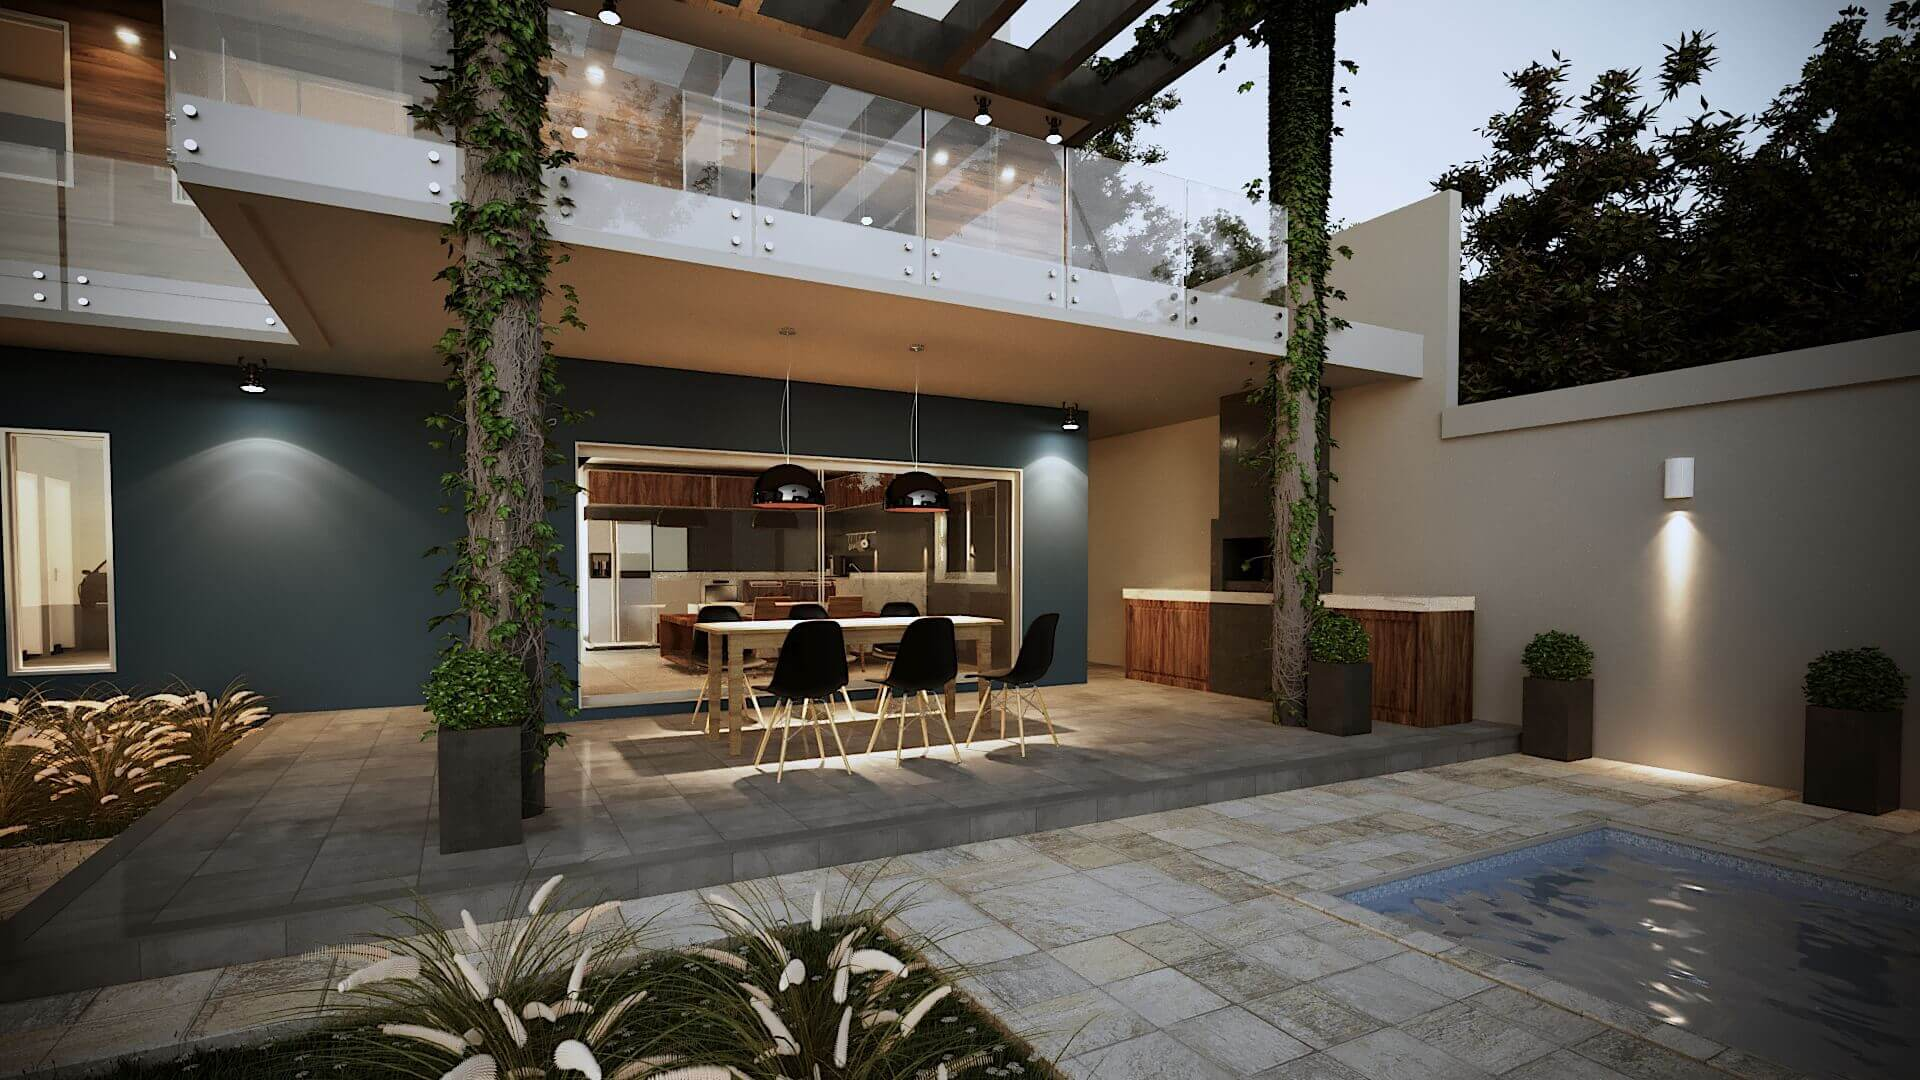 Projeto Casa Fachada modernista, piscina